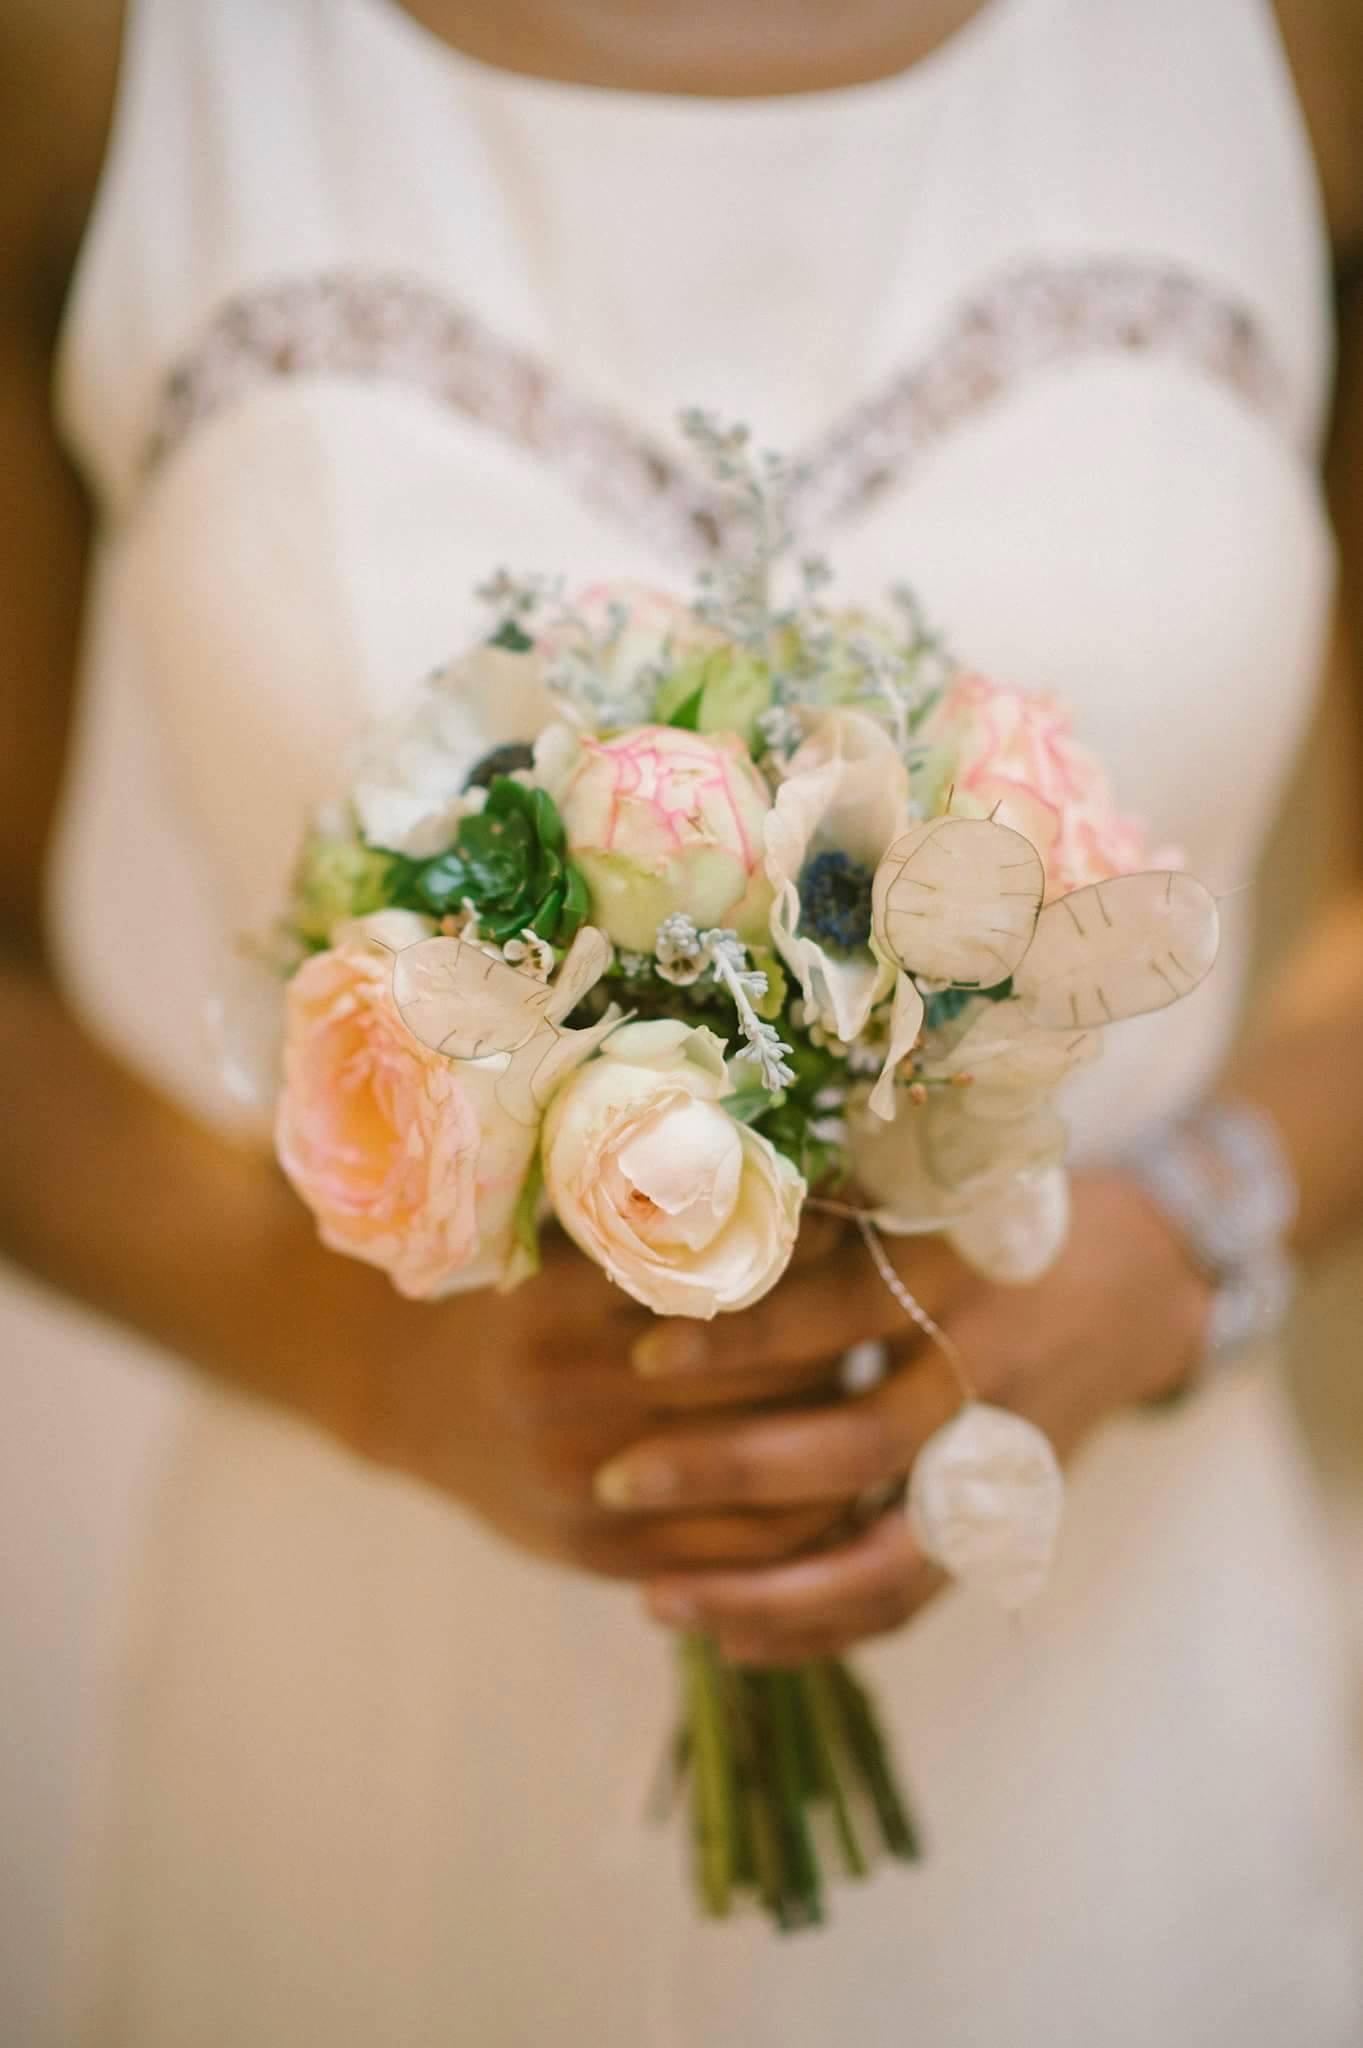 joli bouquet mariée ton pastel